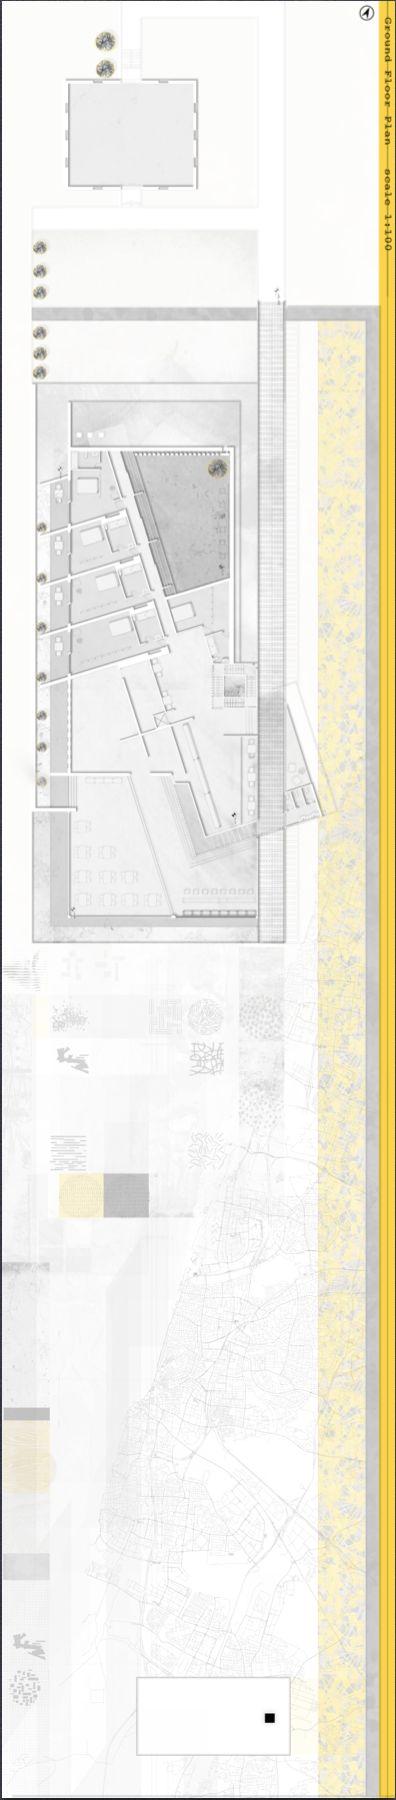 Chava Levin Architectural Studio, Ariel University year two.